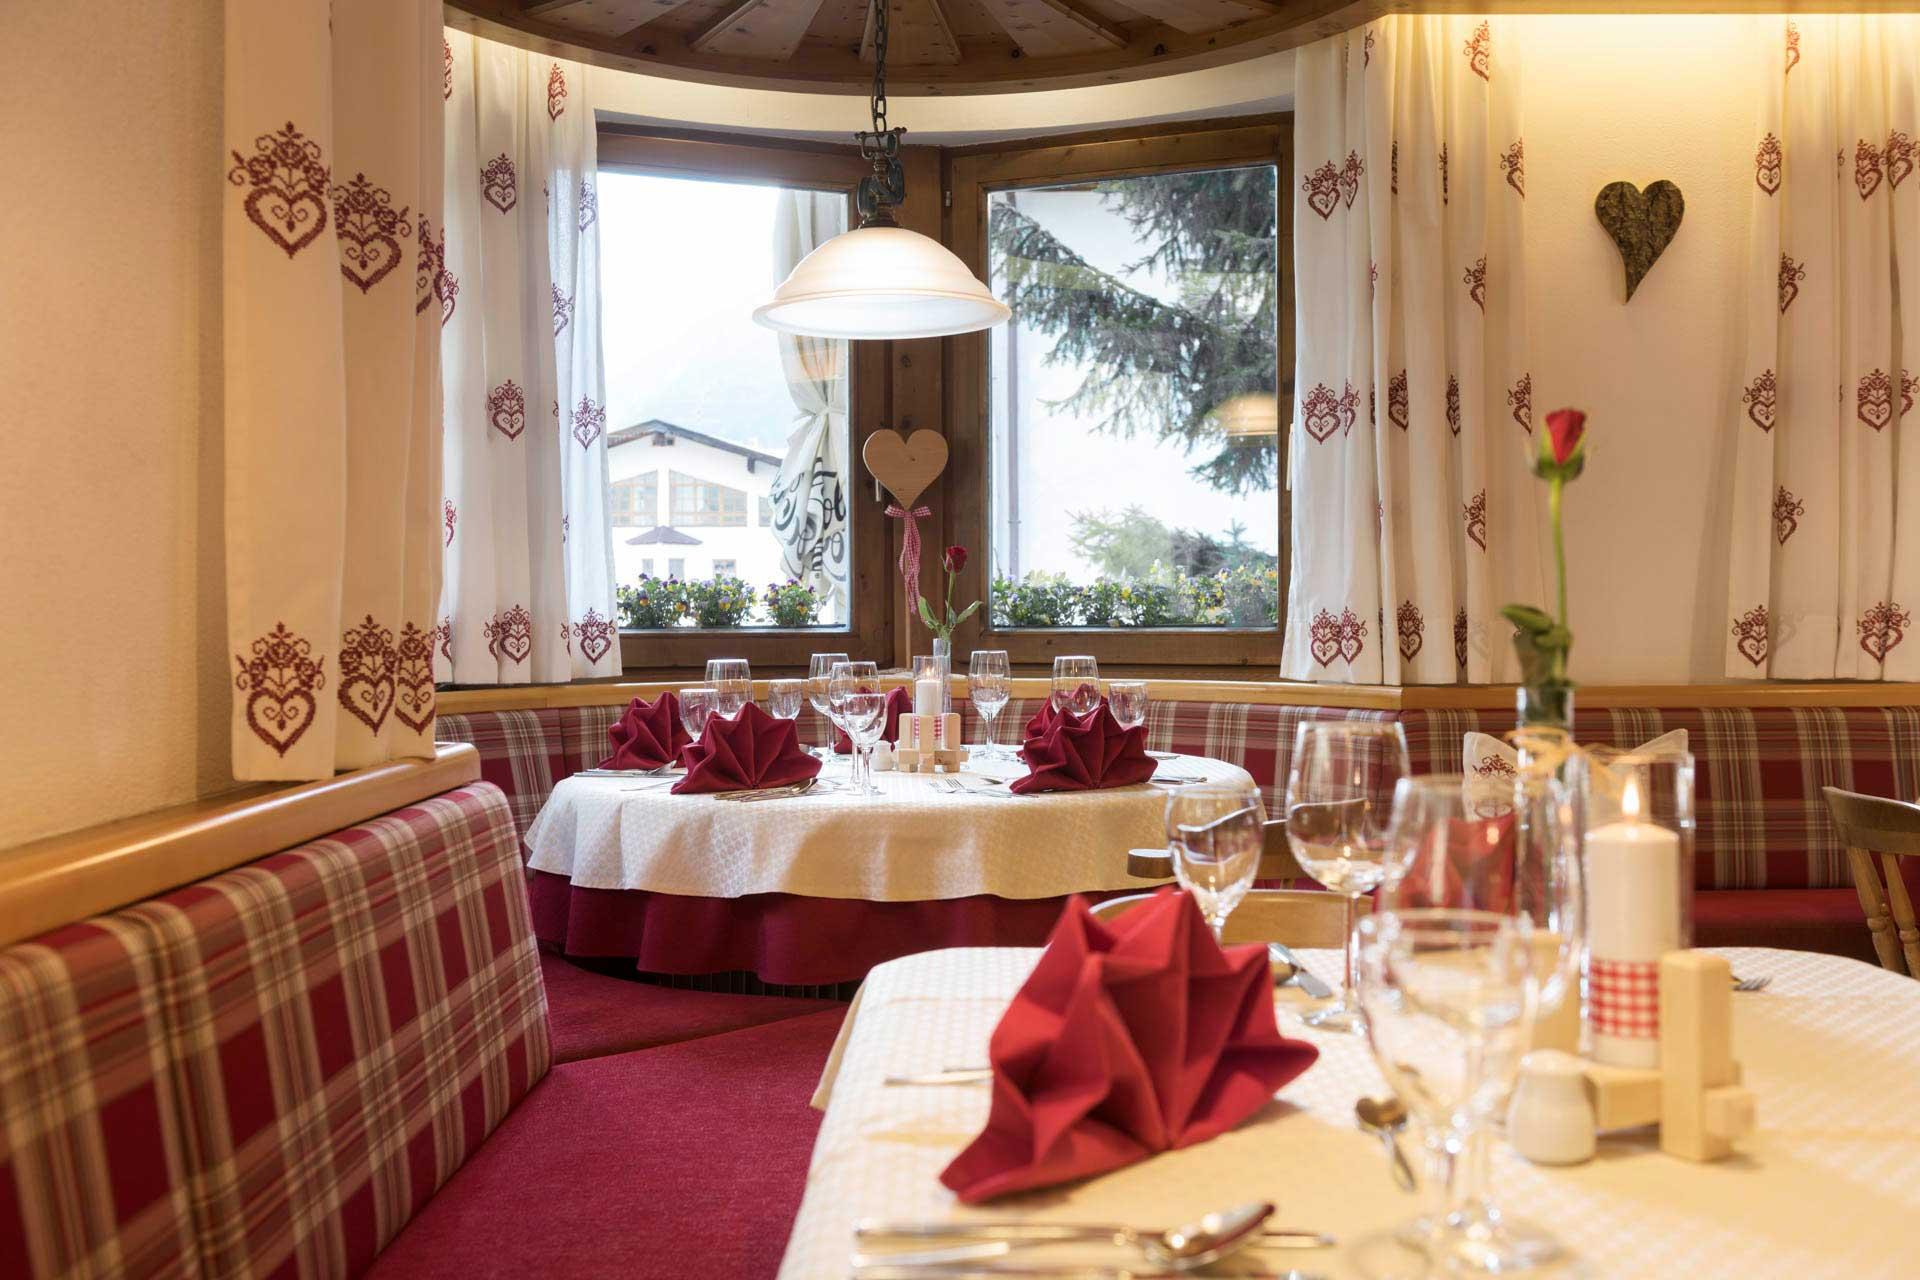 Hotel-Angelika-Galerie-Speisesaal-festlich1